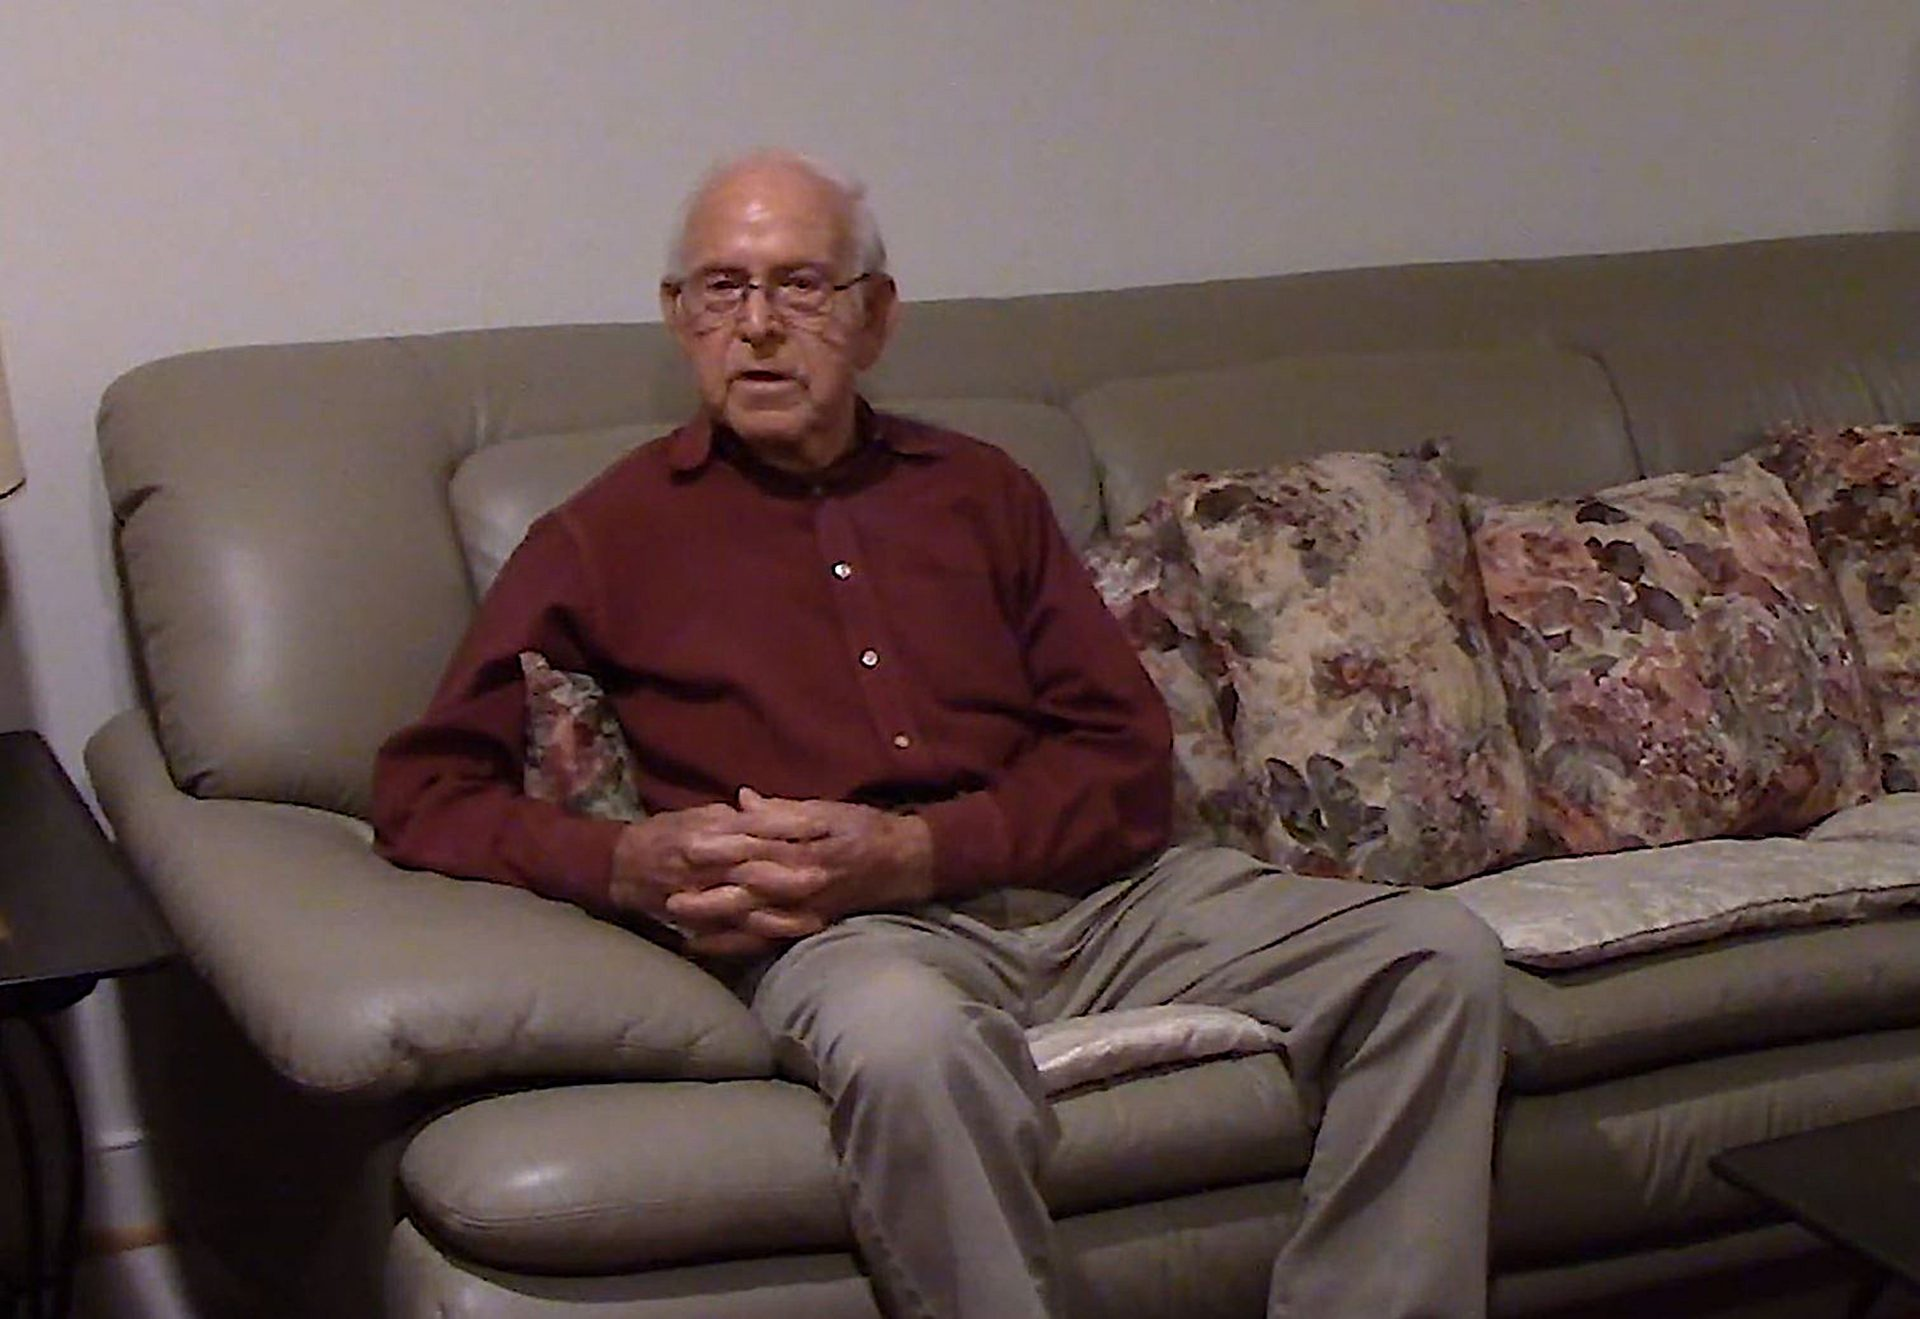 Community member Manley Garber passes away